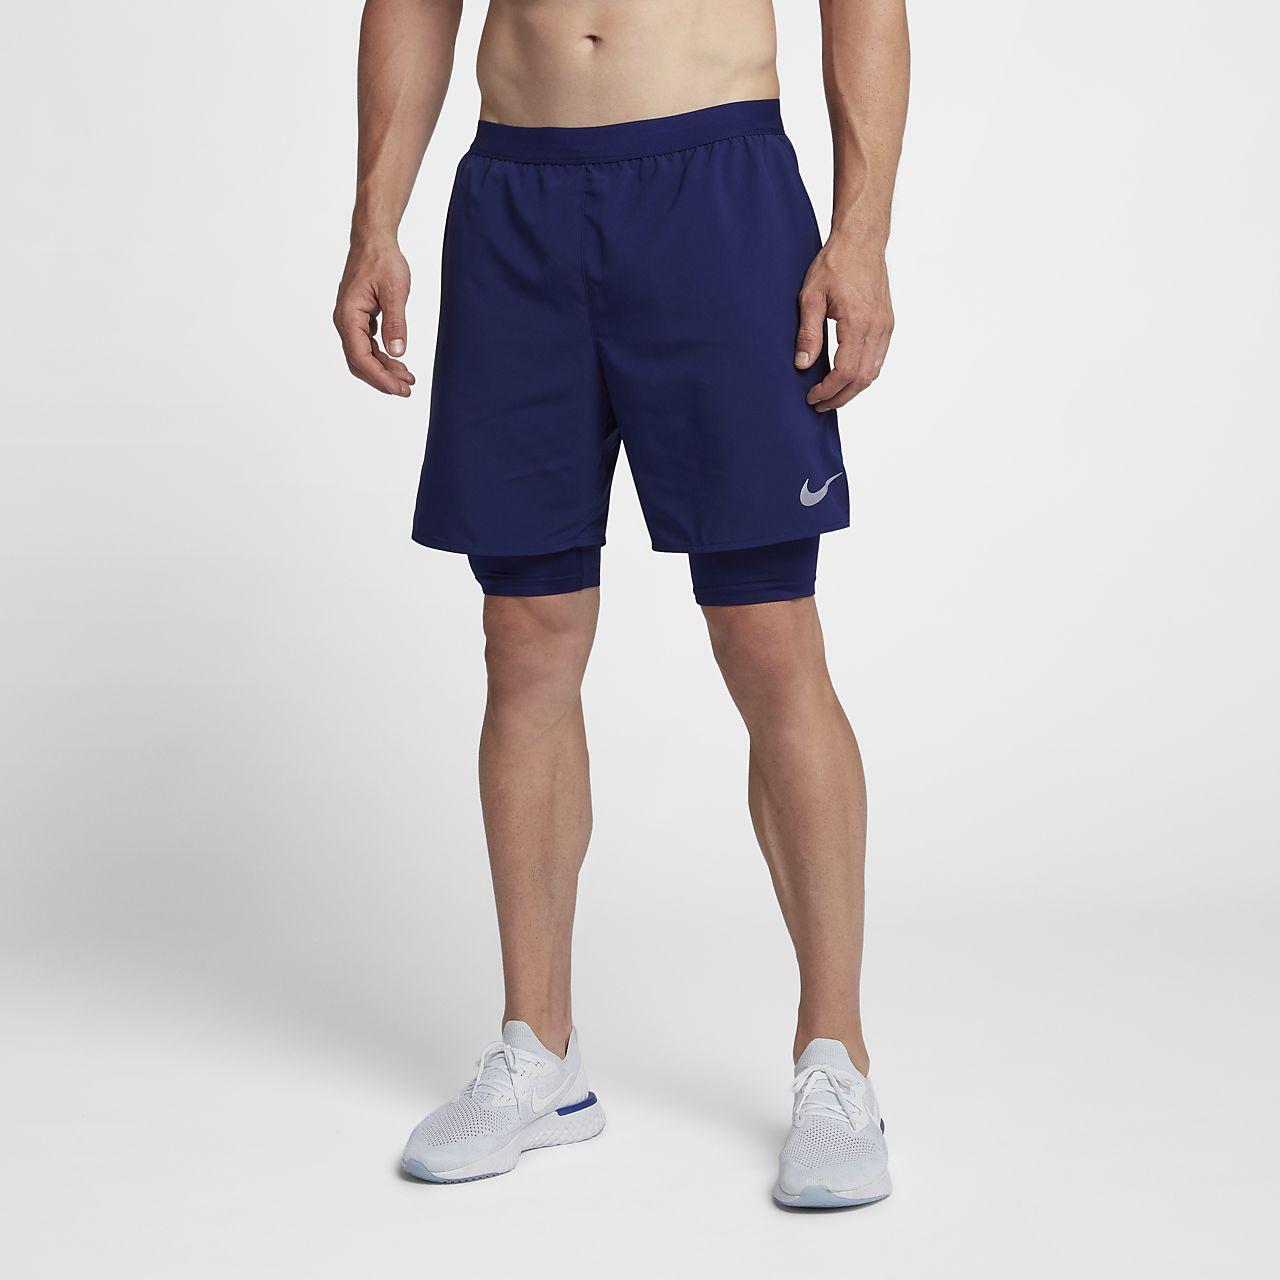 3668d6389 Shorts de running 2 en 1 para hombre Nike Flex Stride. Nike.com CL